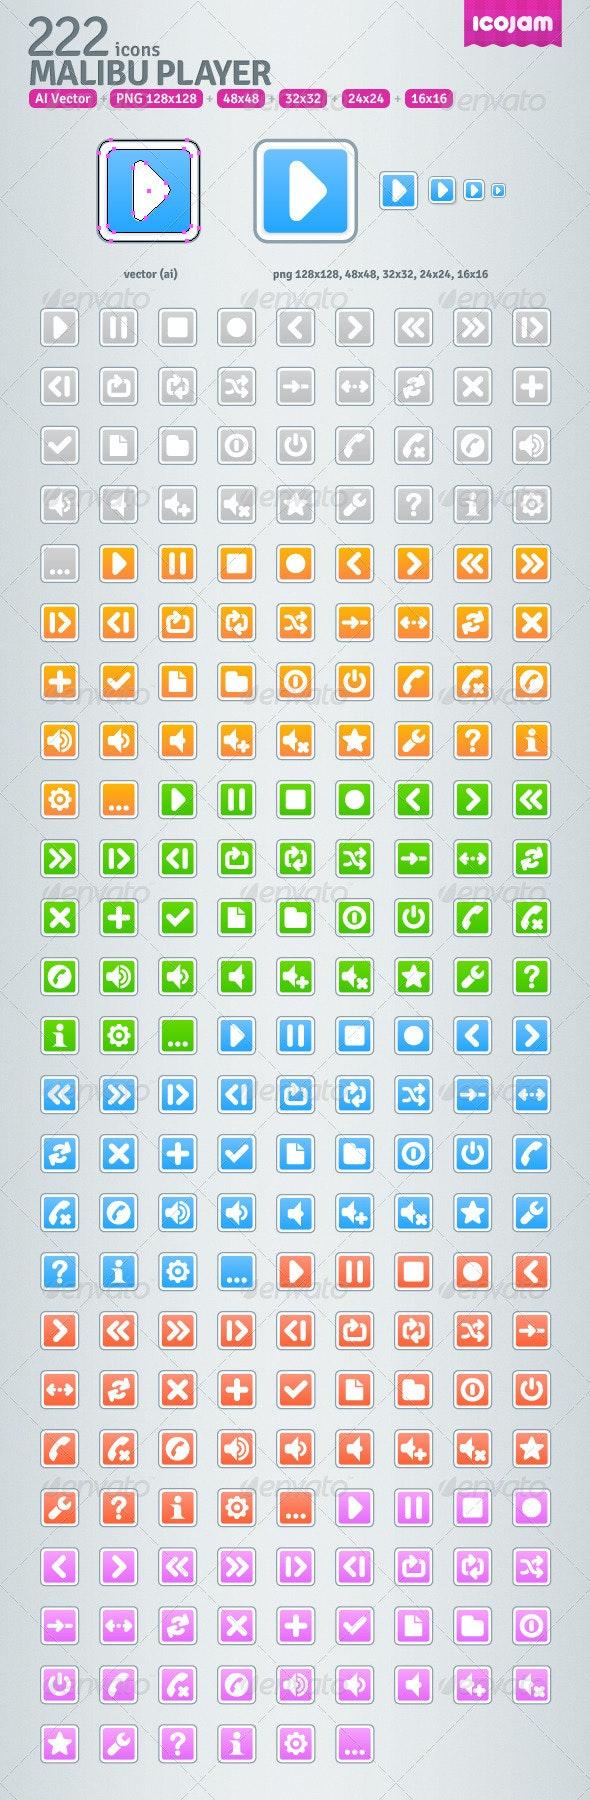 222 AI Malibu Player icons - Media Icons